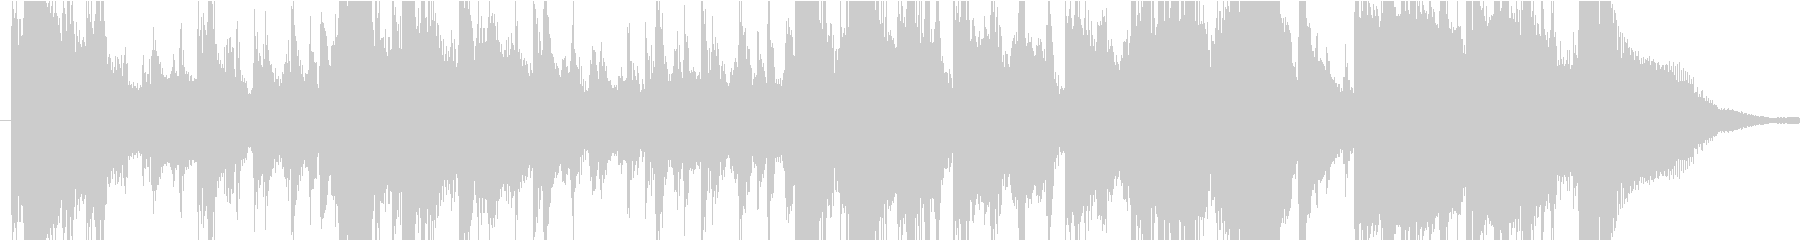 T.V.コンテンポラリー。西洋の、...の未再生の波形